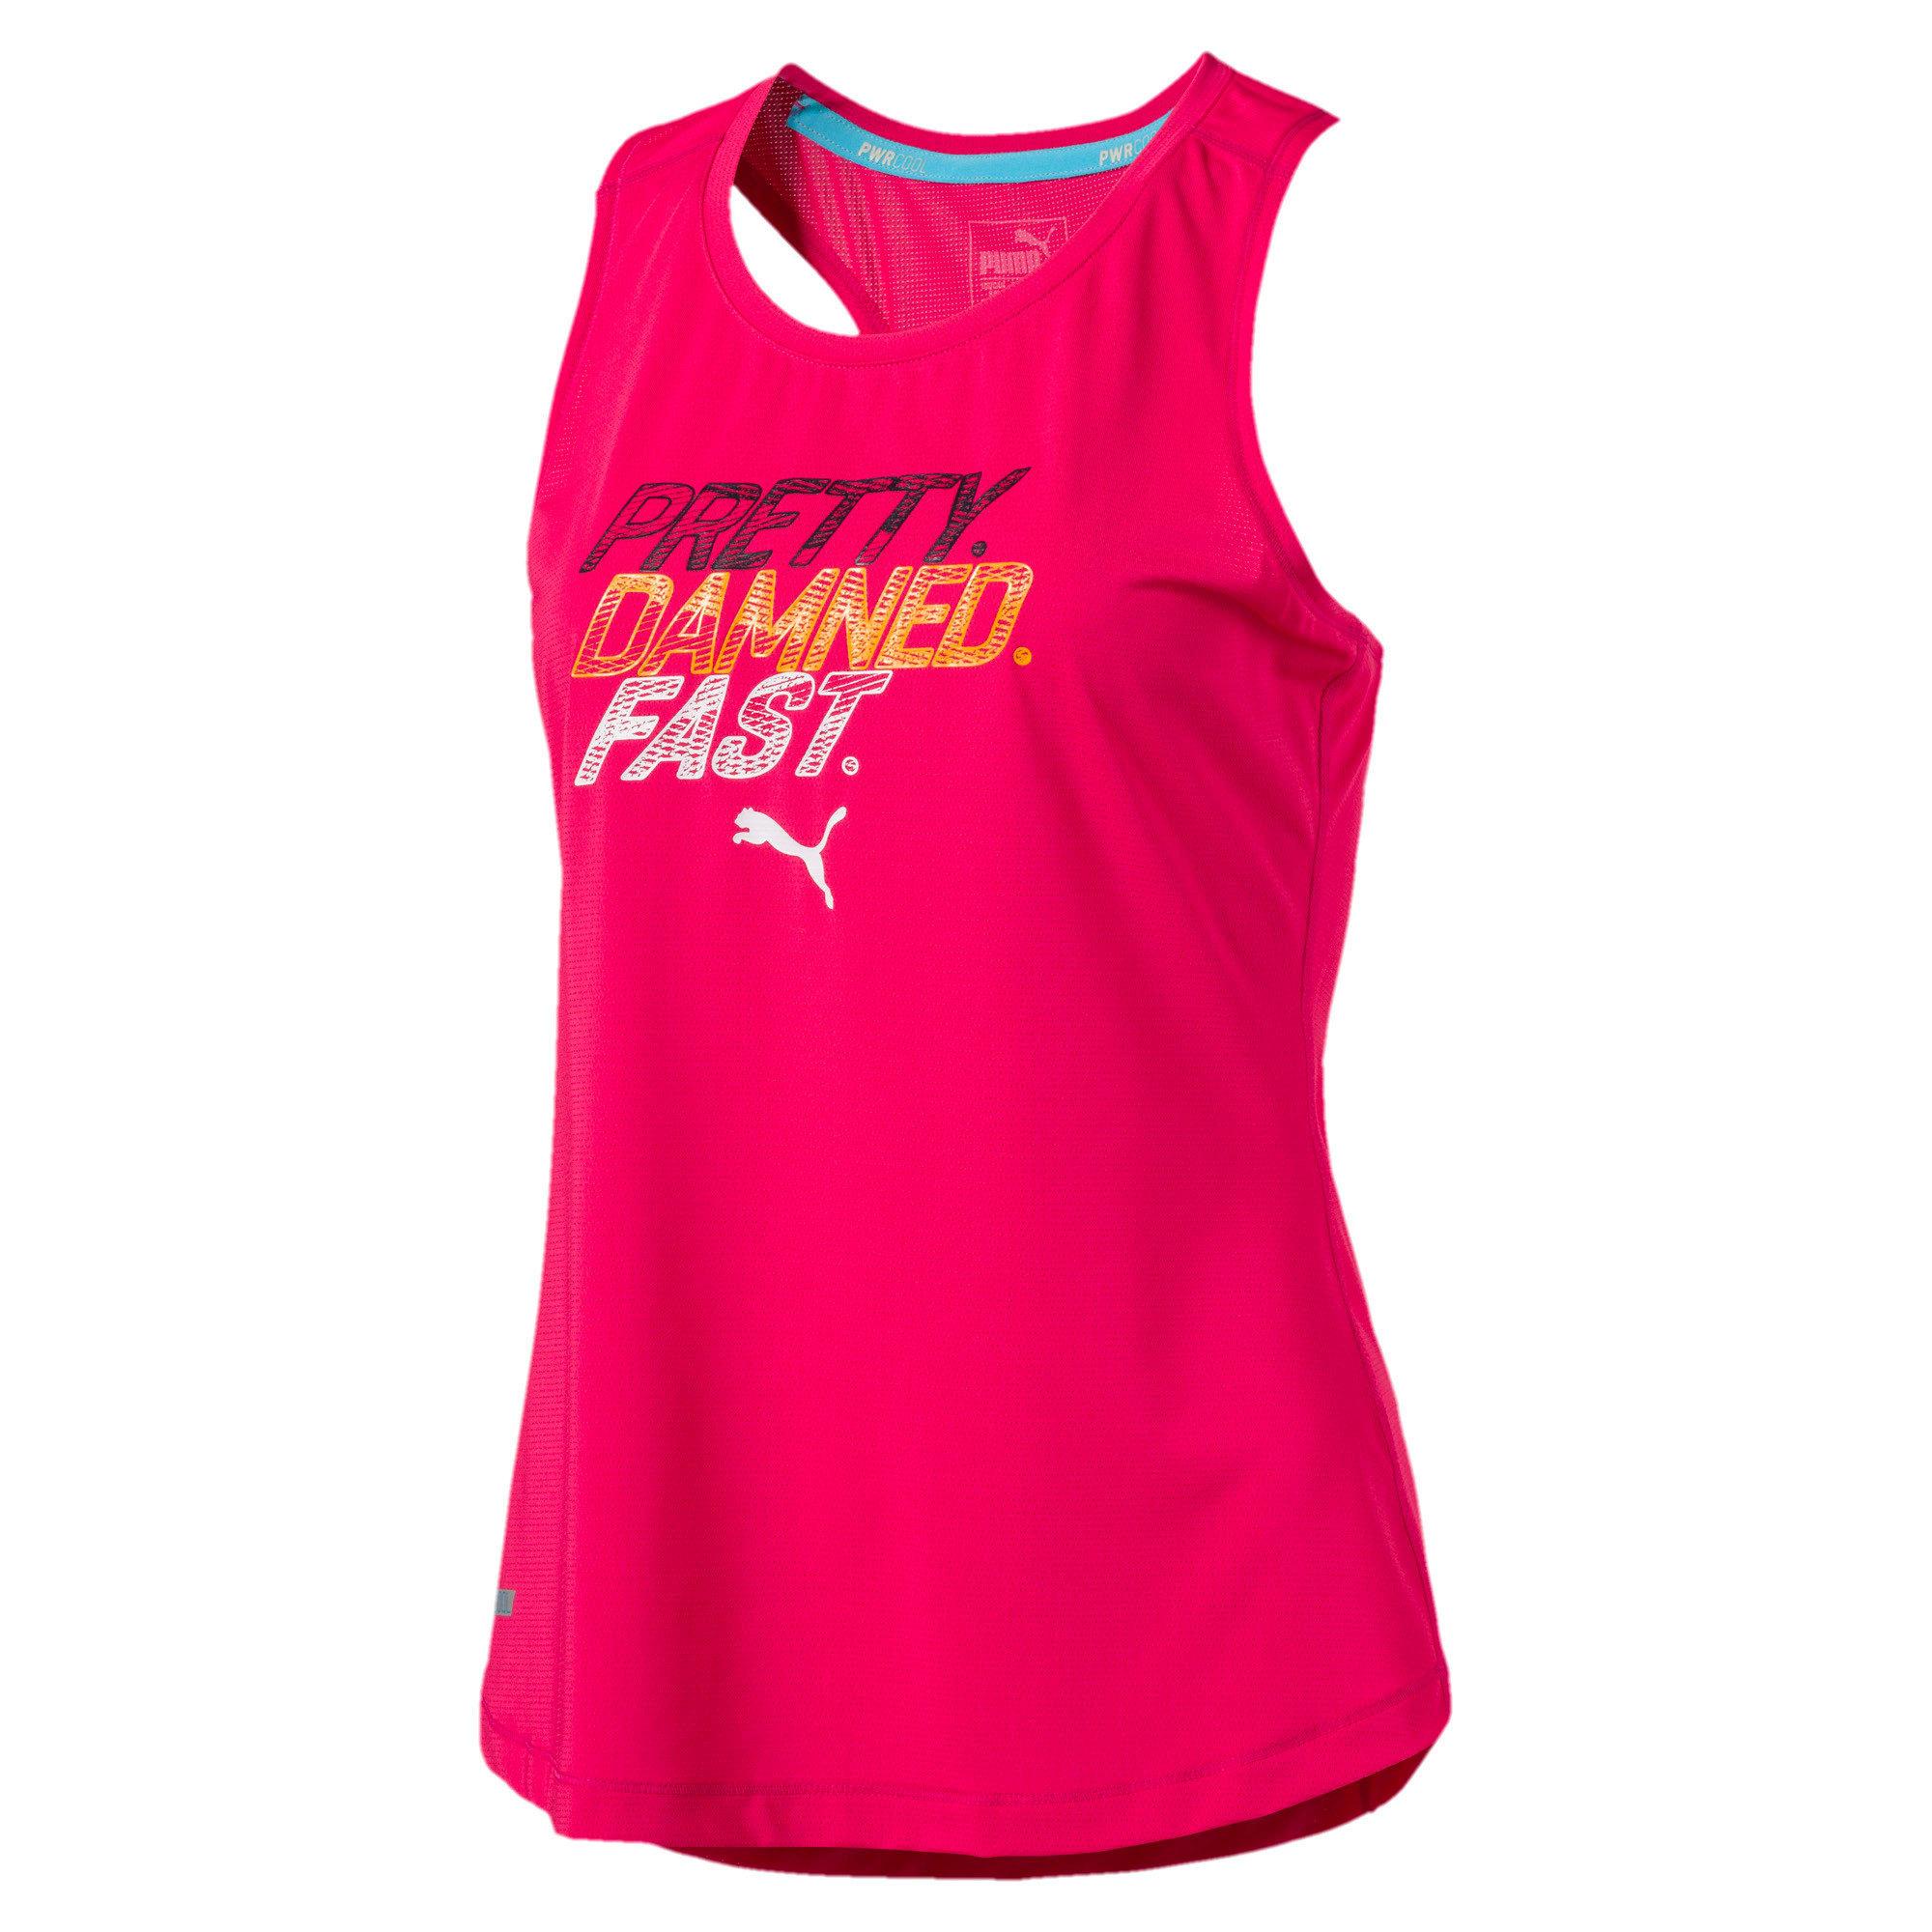 Thumbnail 4 of Running Women's PWRCOOL Slogan Tank Top, SPARKLING COSMO, medium-IND